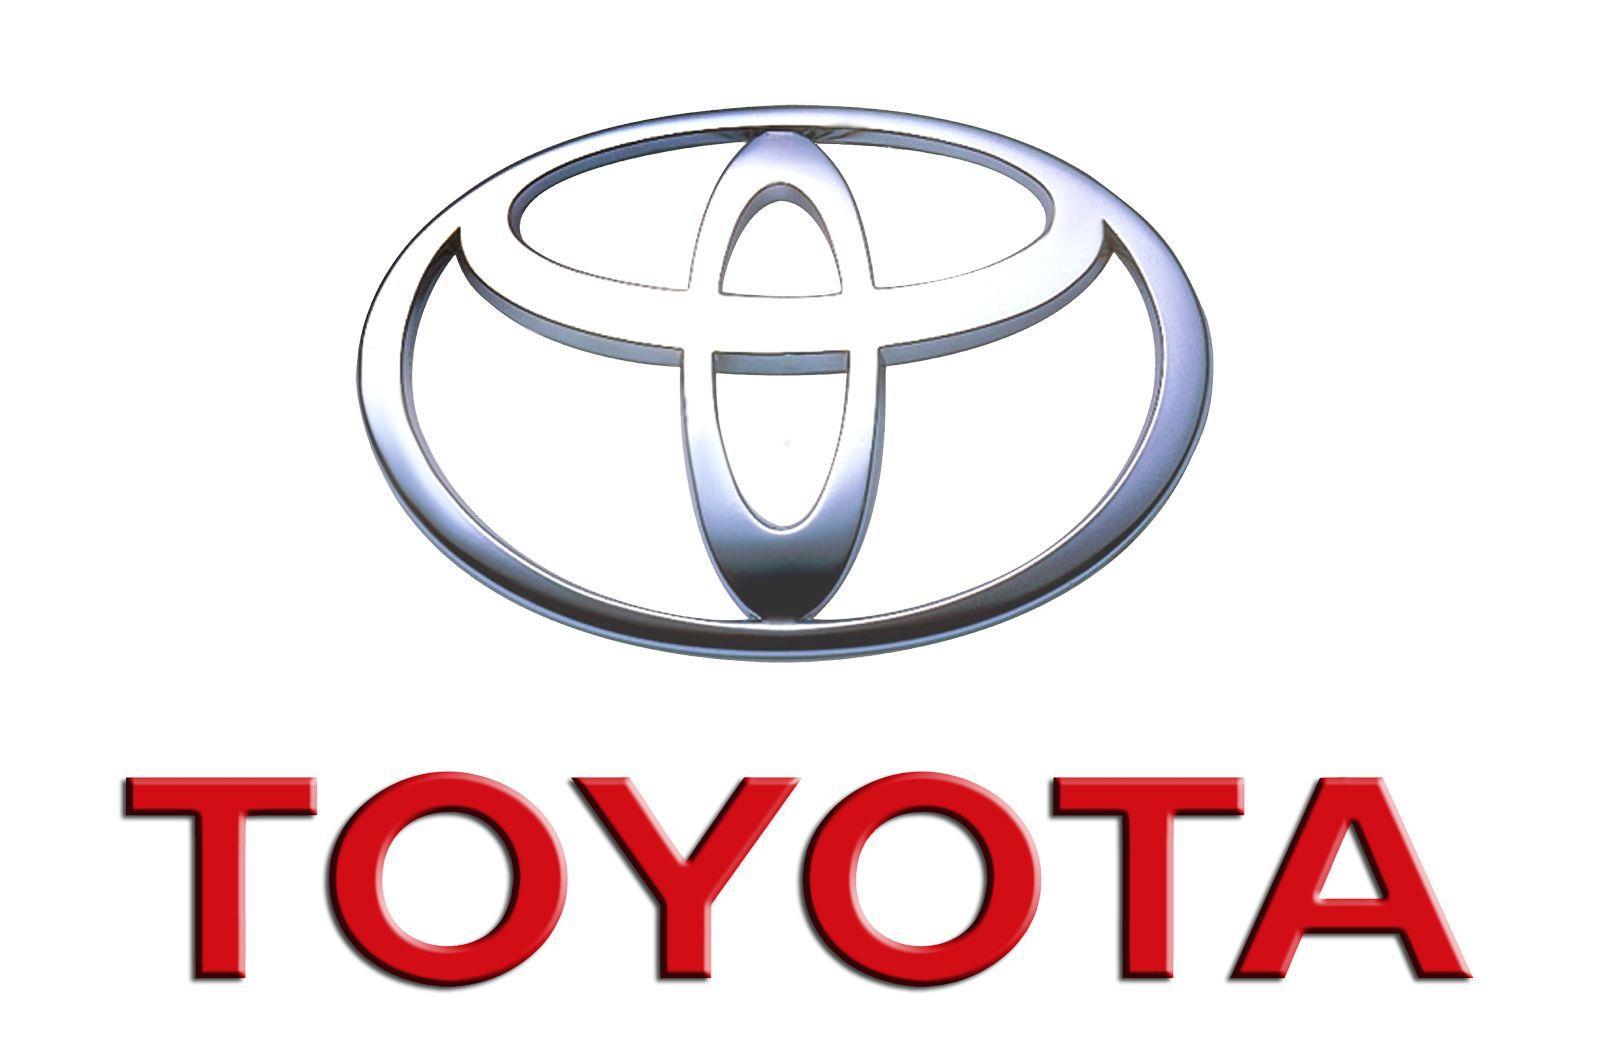 Toyota Logo Wallpapers 1600x1063